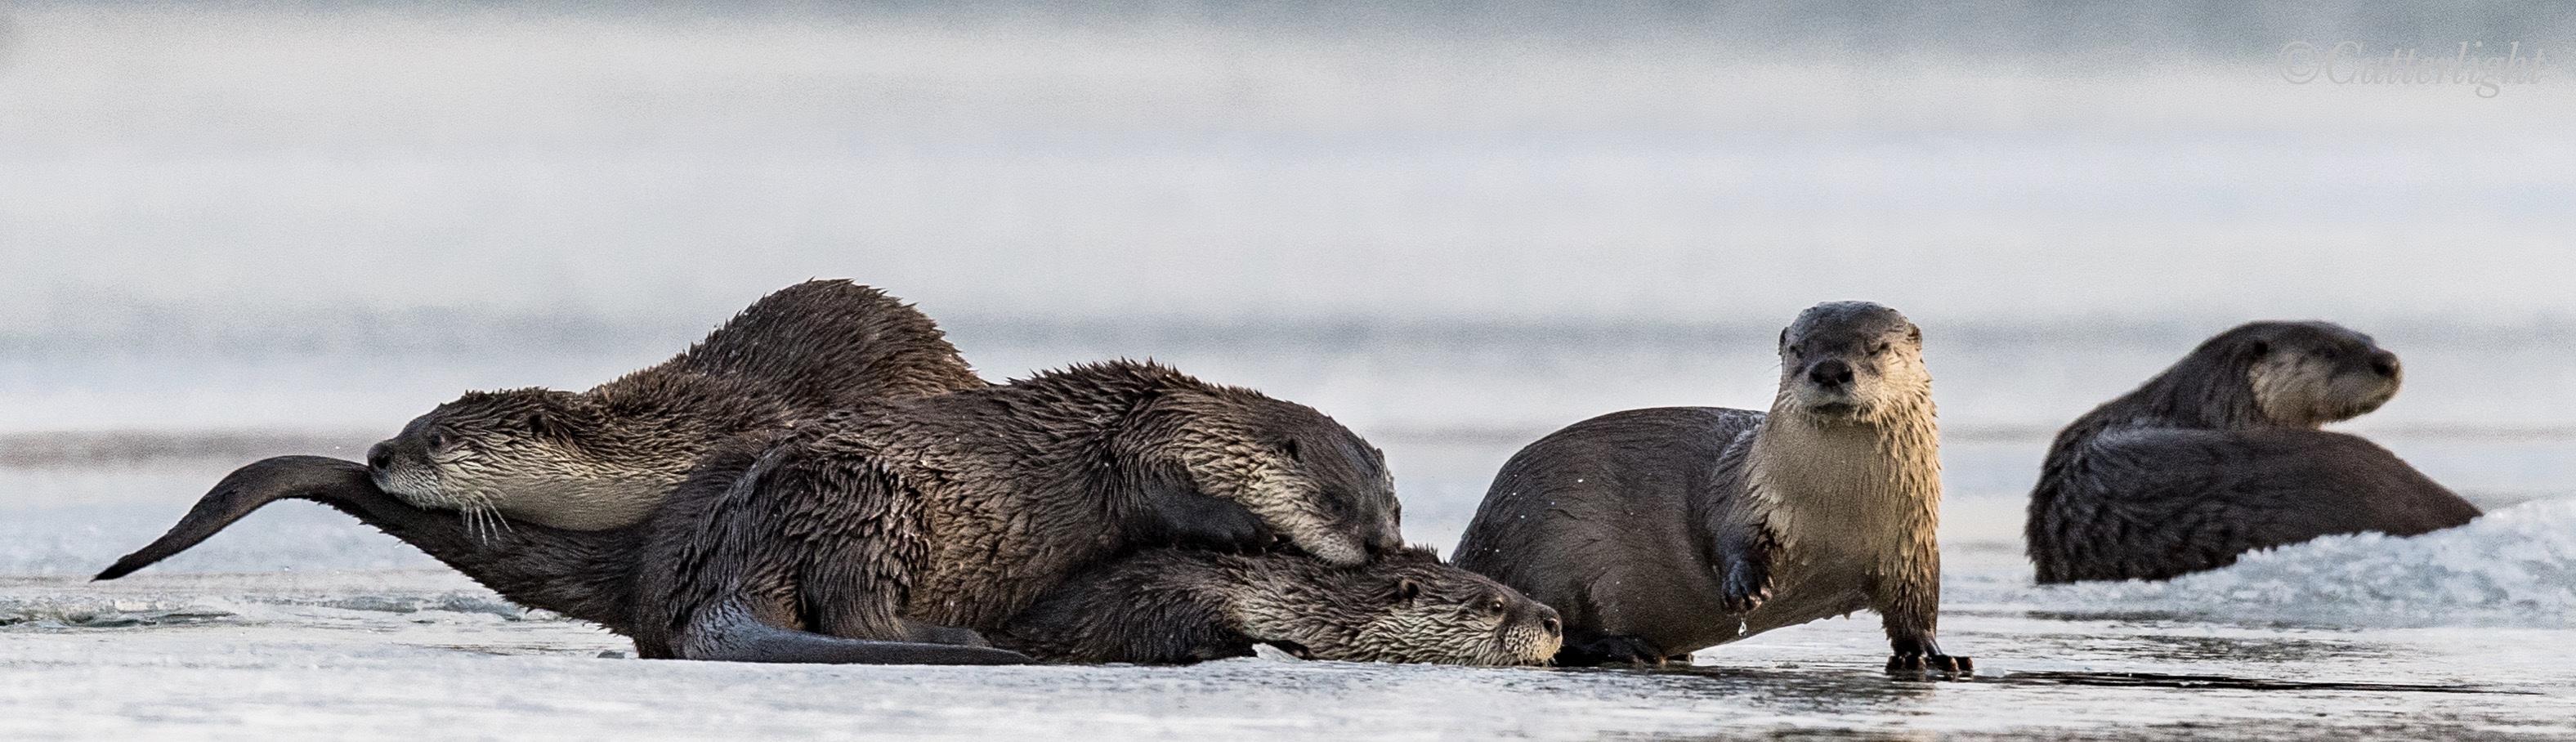 Chignik Lake River Otters